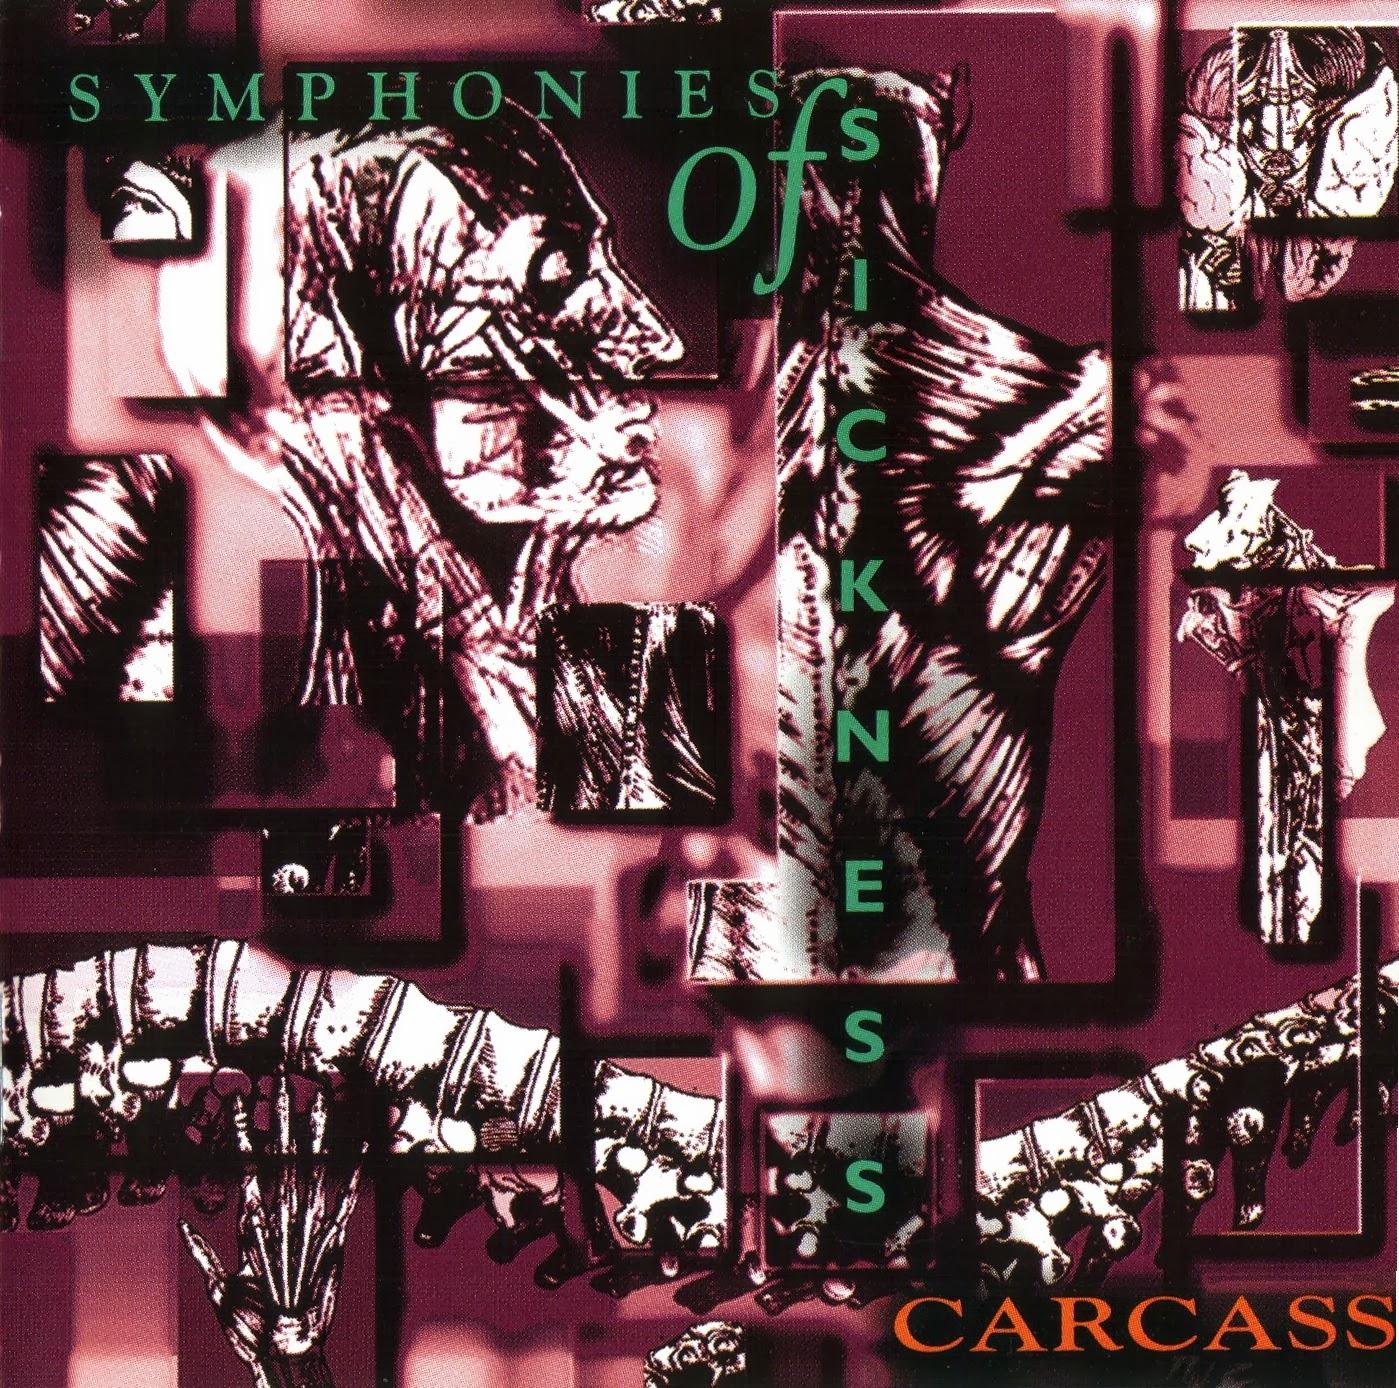 Carcass – Discography [320 kbps][Mega] | Valhalla Metal ...